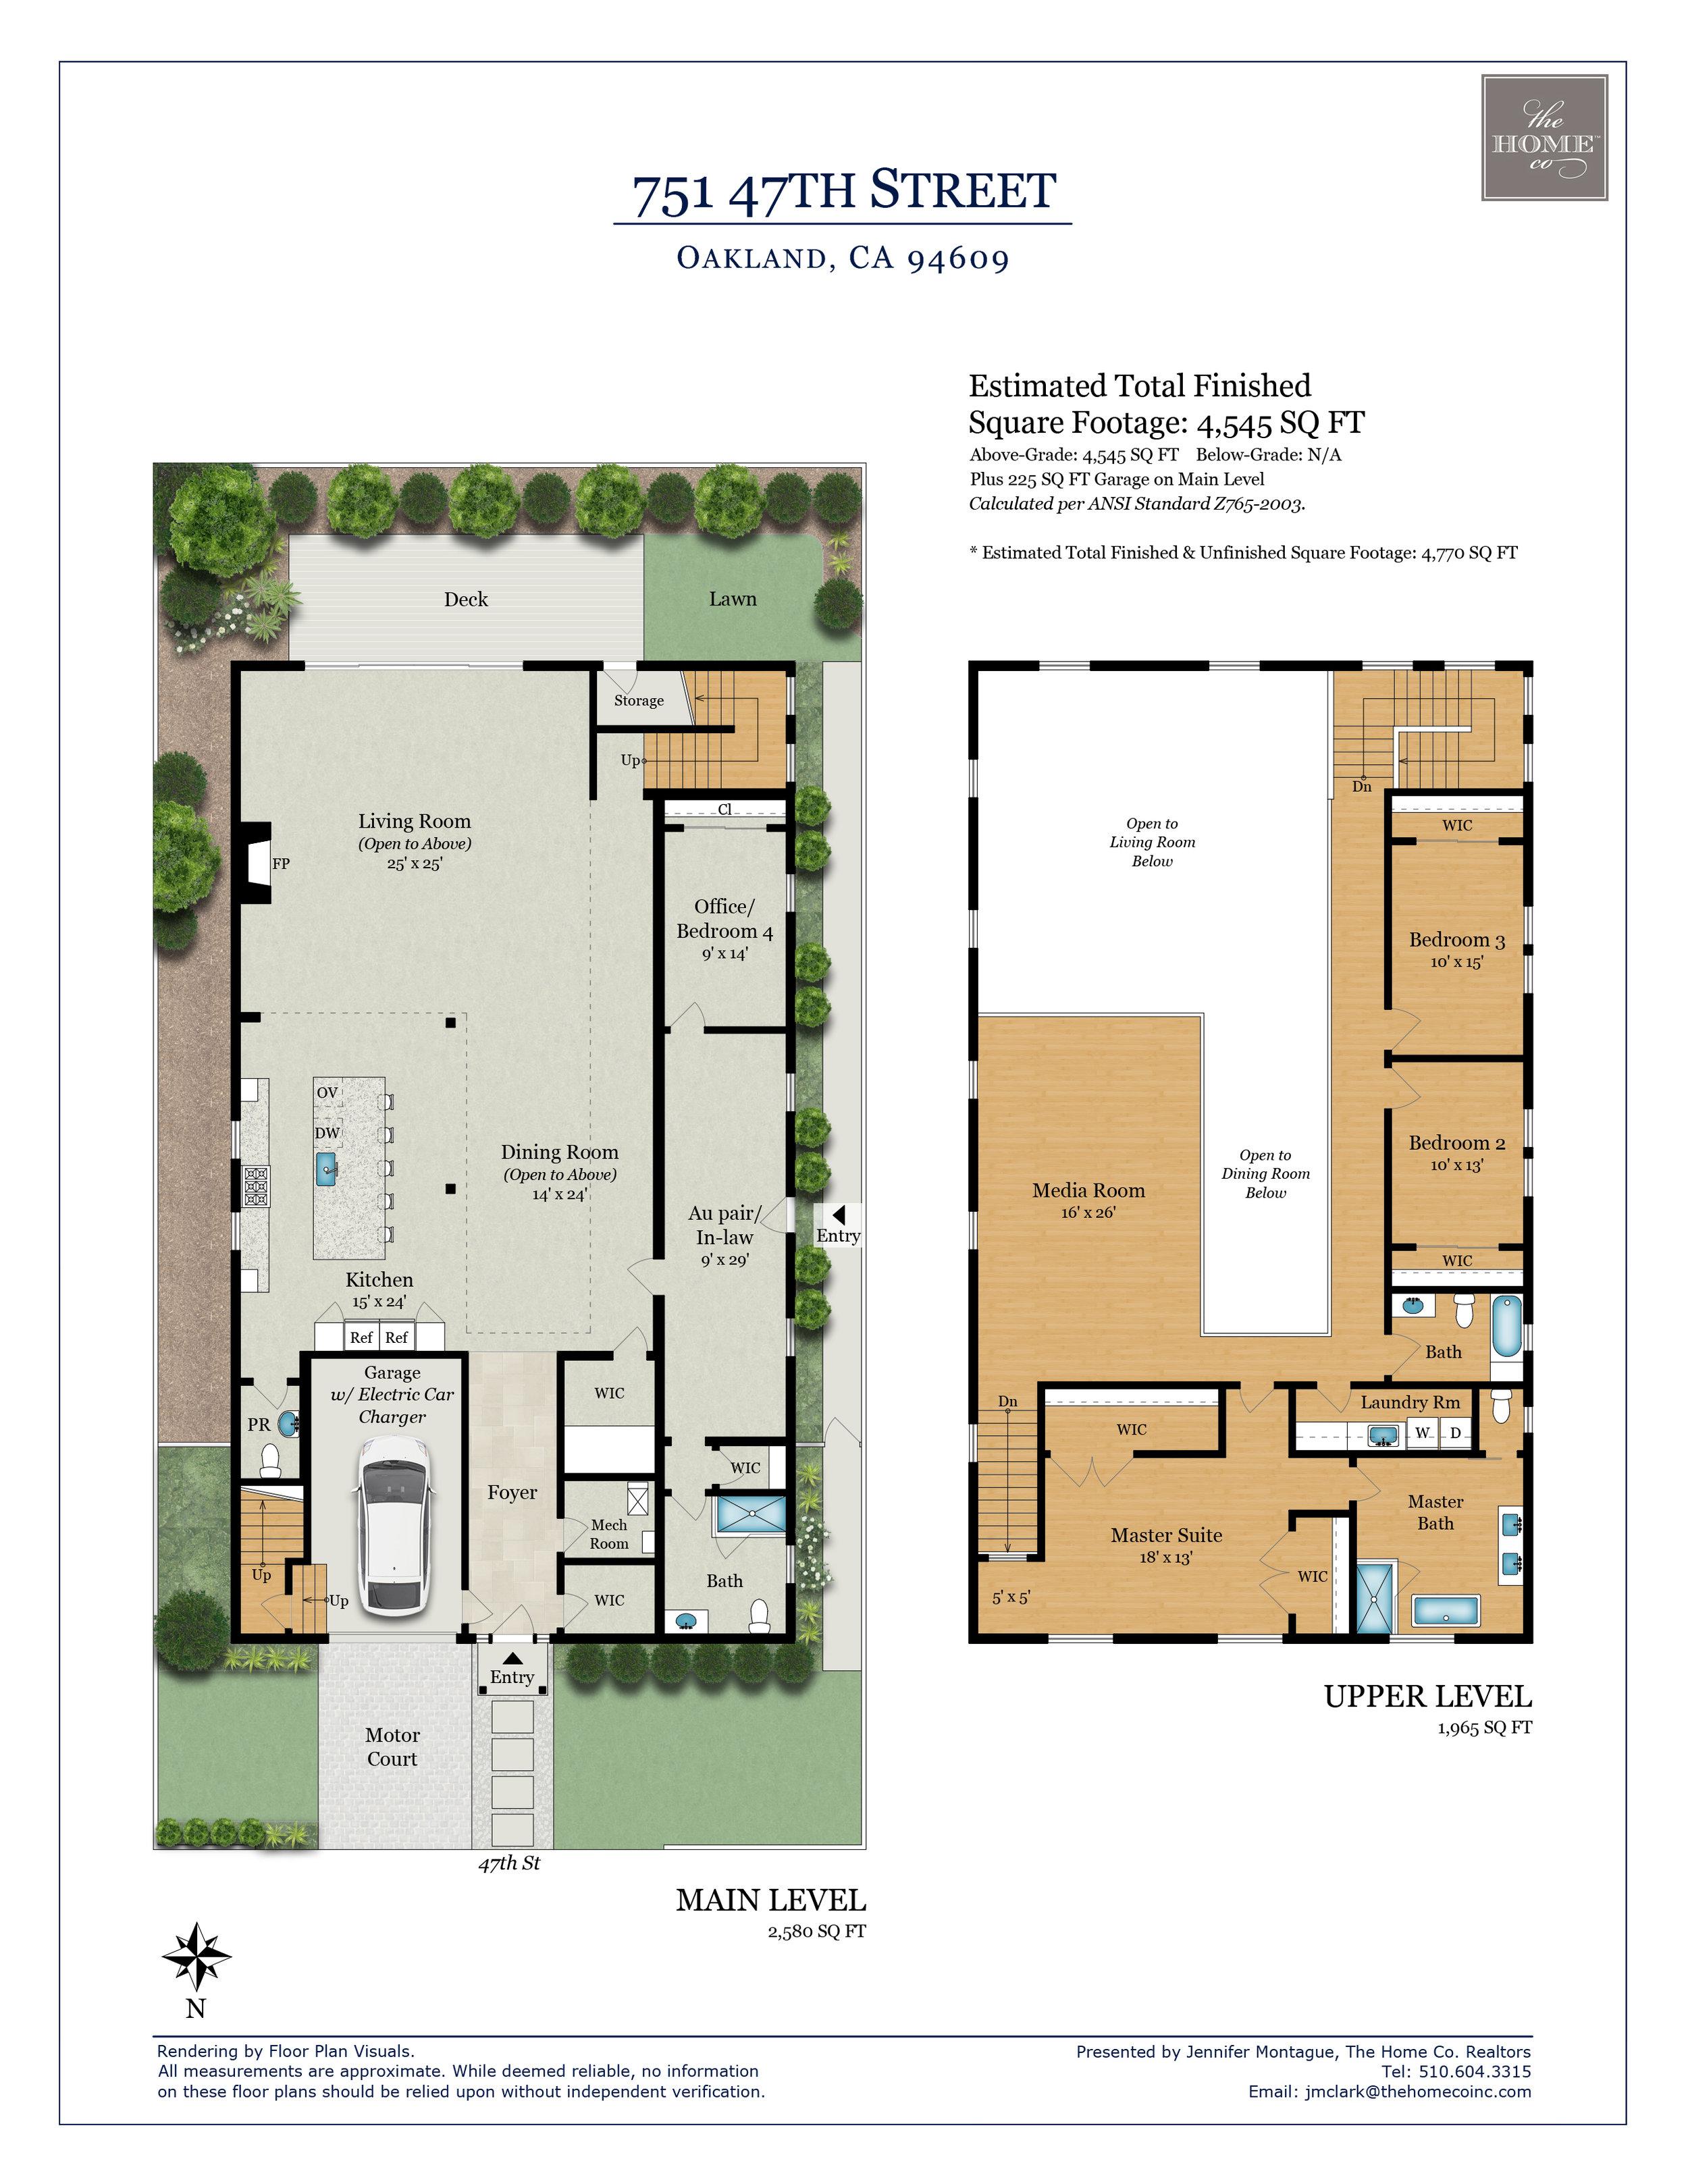 751 47th Street Temescal Oakland Floor Plan